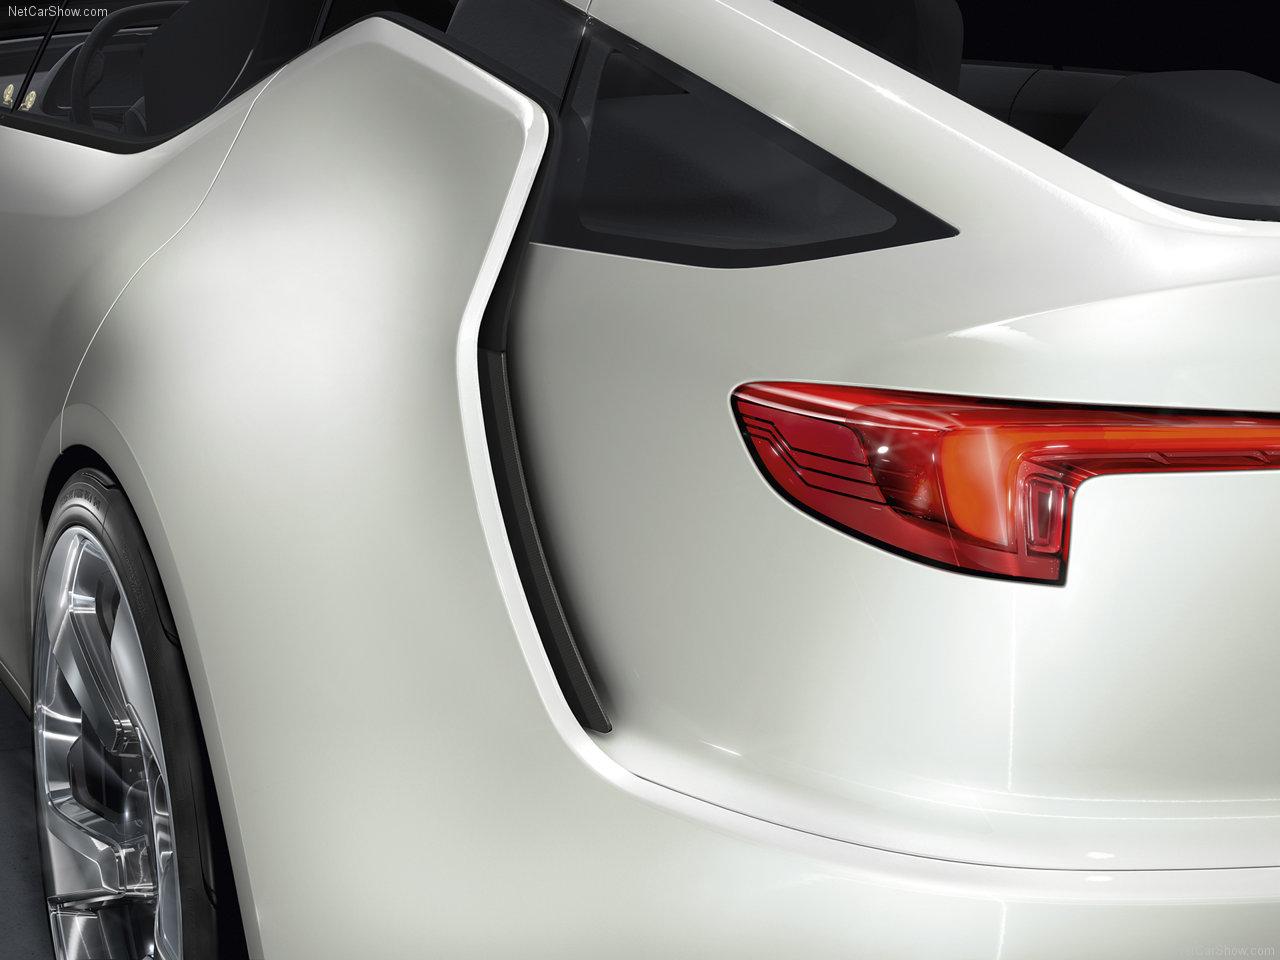 http://3.bp.blogspot.com/_lsyt_wQ2awY/TDtA9kIPJGI/AAAAAAAB-Bo/_RAdWb538KU/s1600/Opel-Flextreme_GT-E_Concept_2010_1280x960_wallpaper_06.jpg